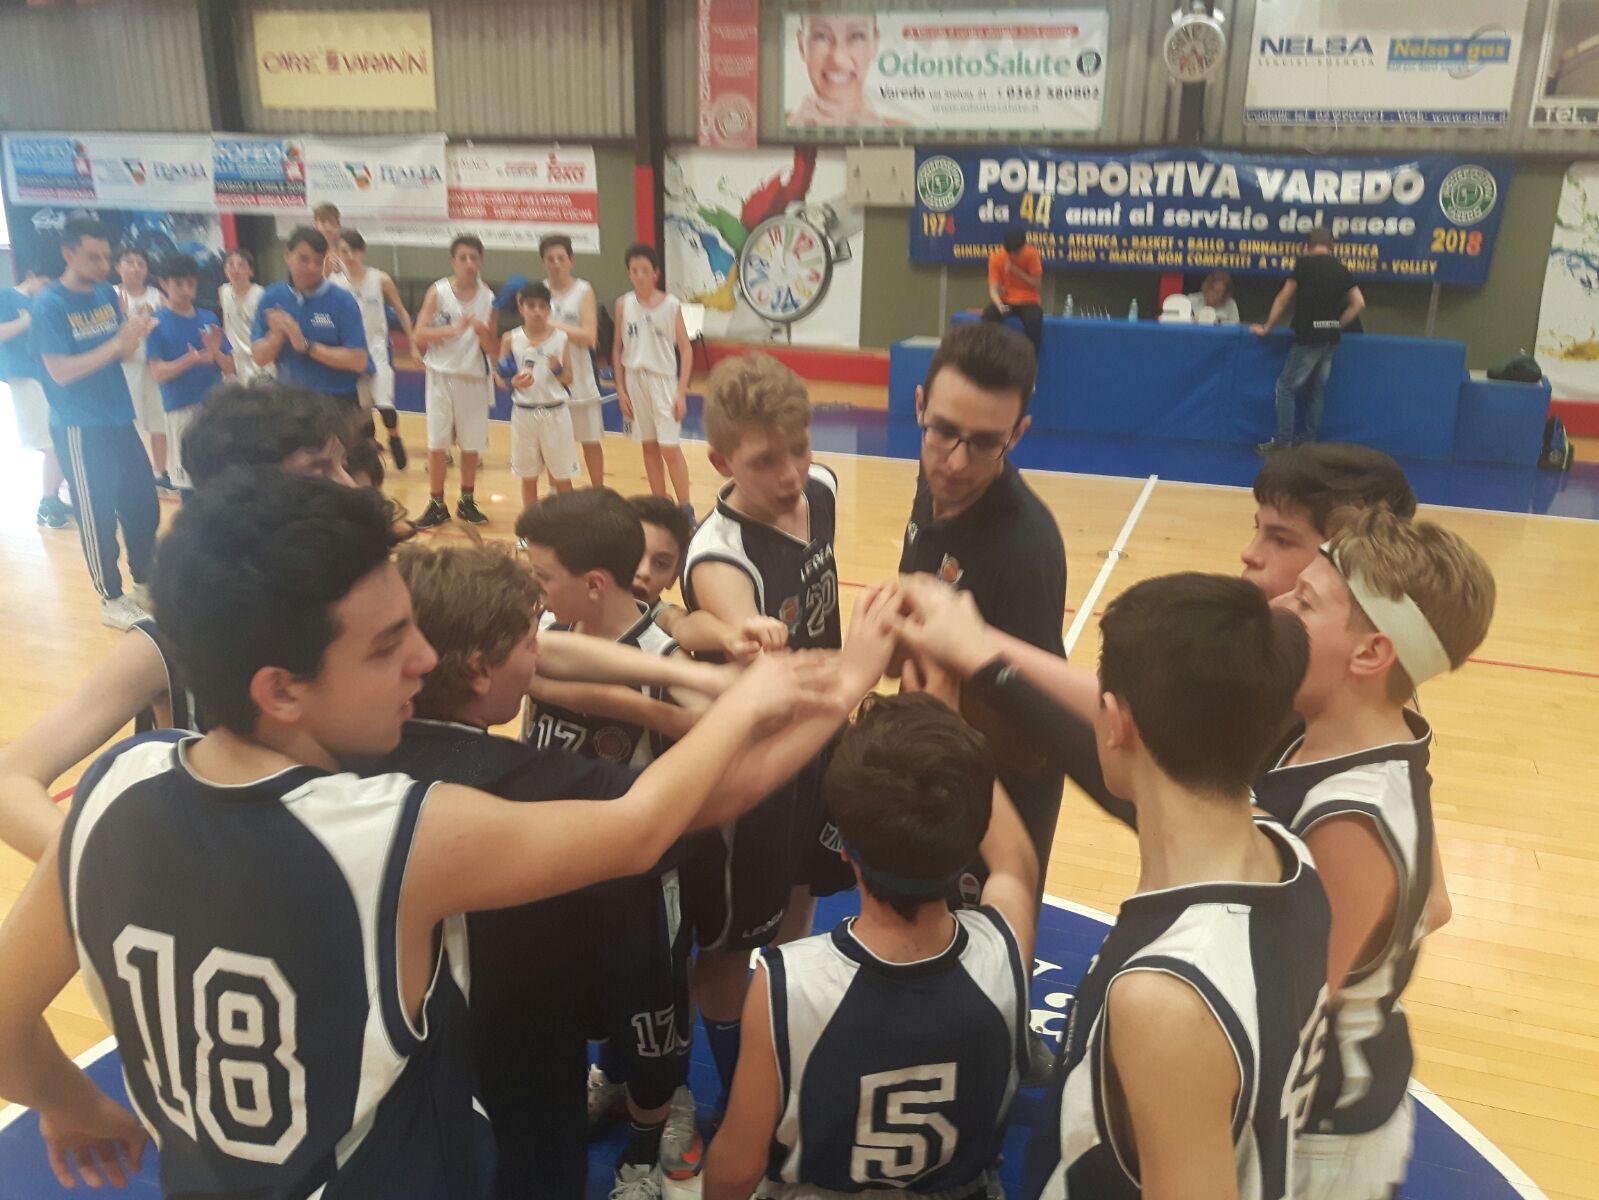 News U13 - Polisportiva Varedo Basket 1a6b6e99b79c